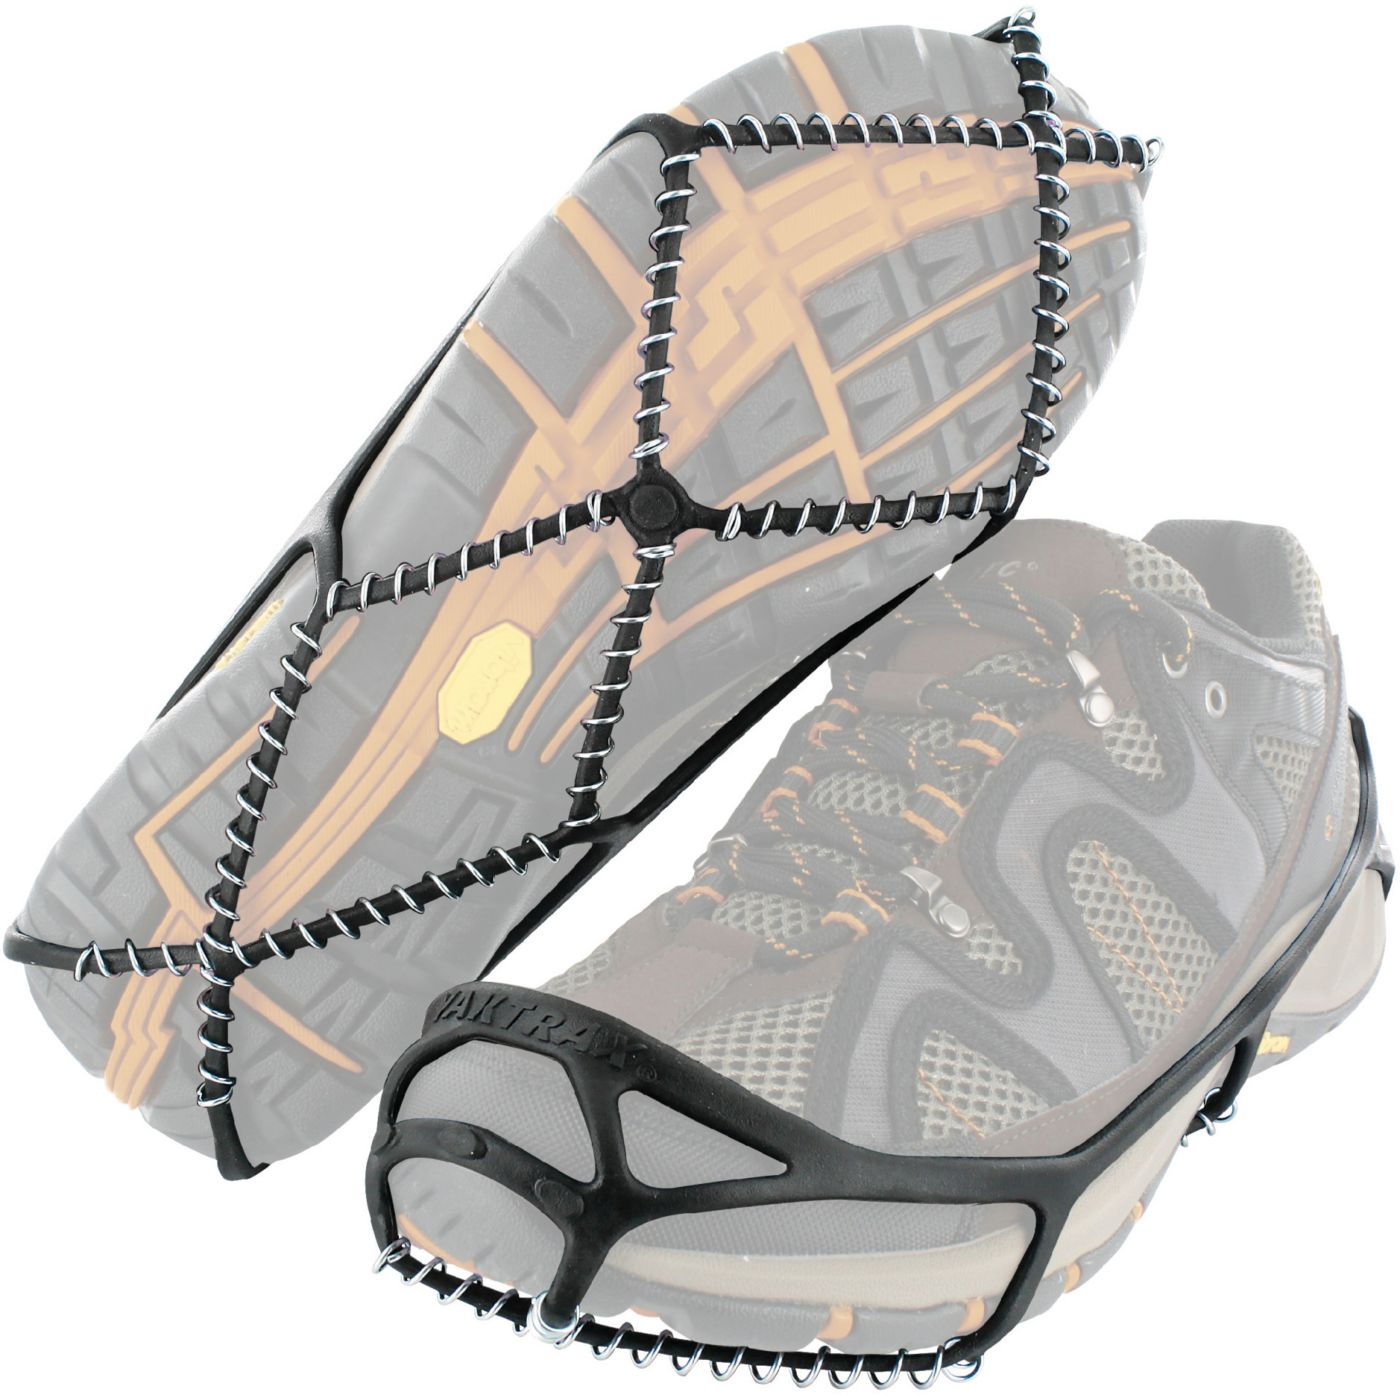 Yaktrax Walk Traction Device